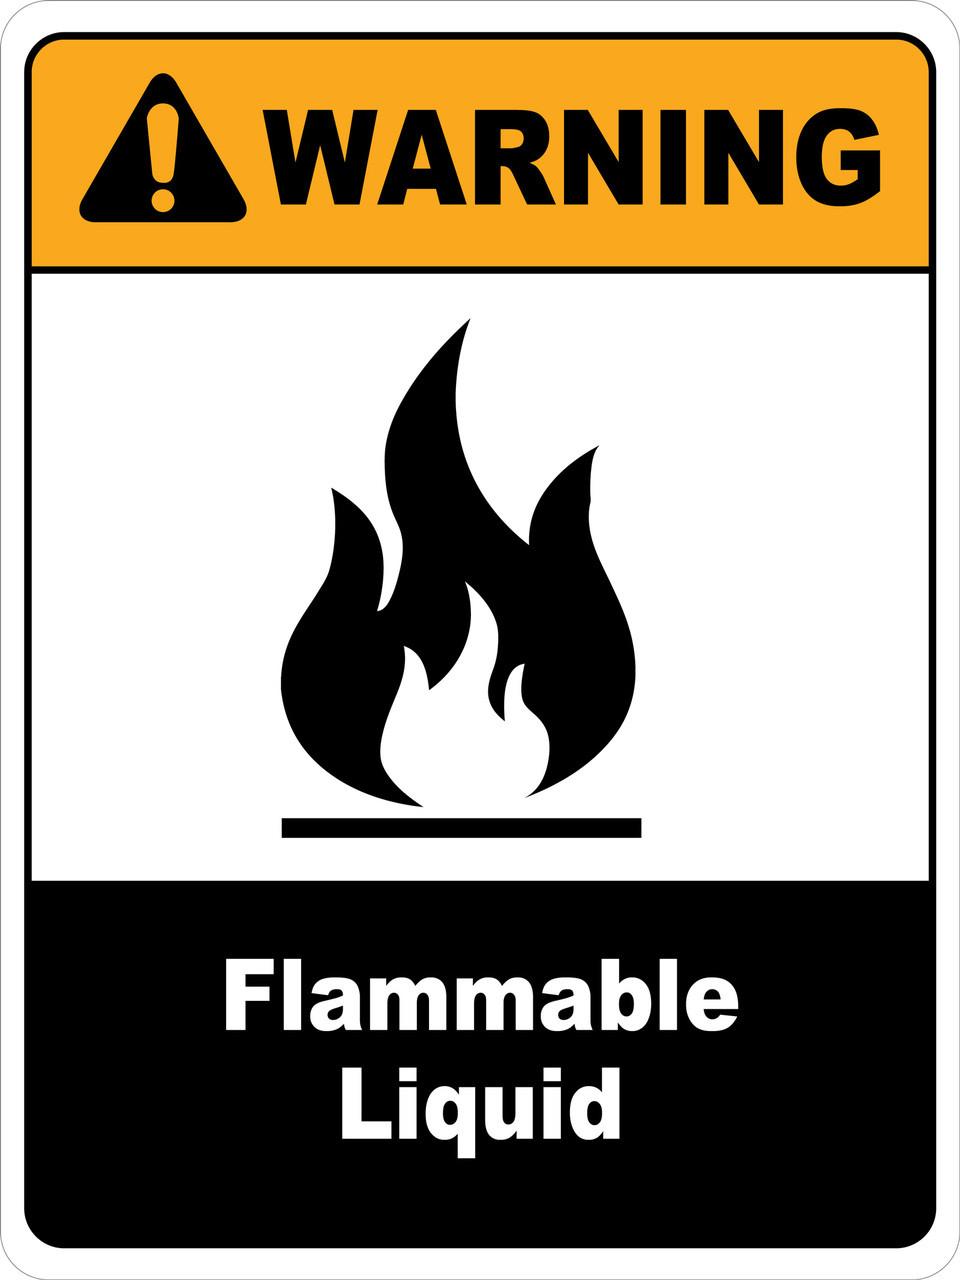 Warning flammable liquids wall sign warning flammable liquids buycottarizona